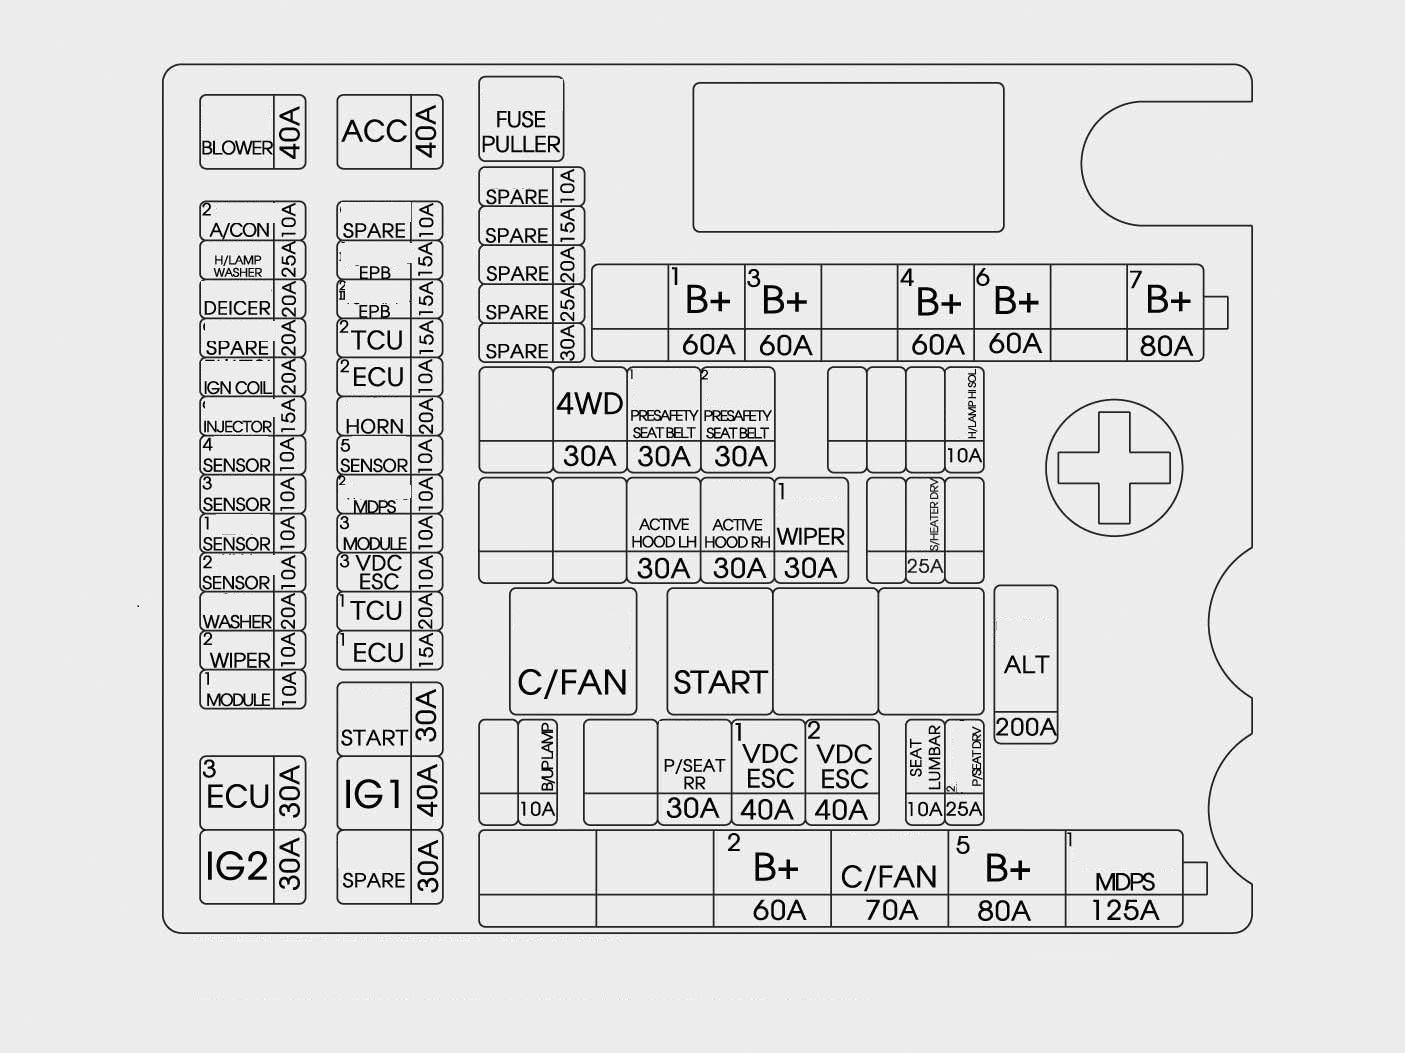 2016 hyundai sonata wiring diagram atv winch relay 2013 genesis fuse box